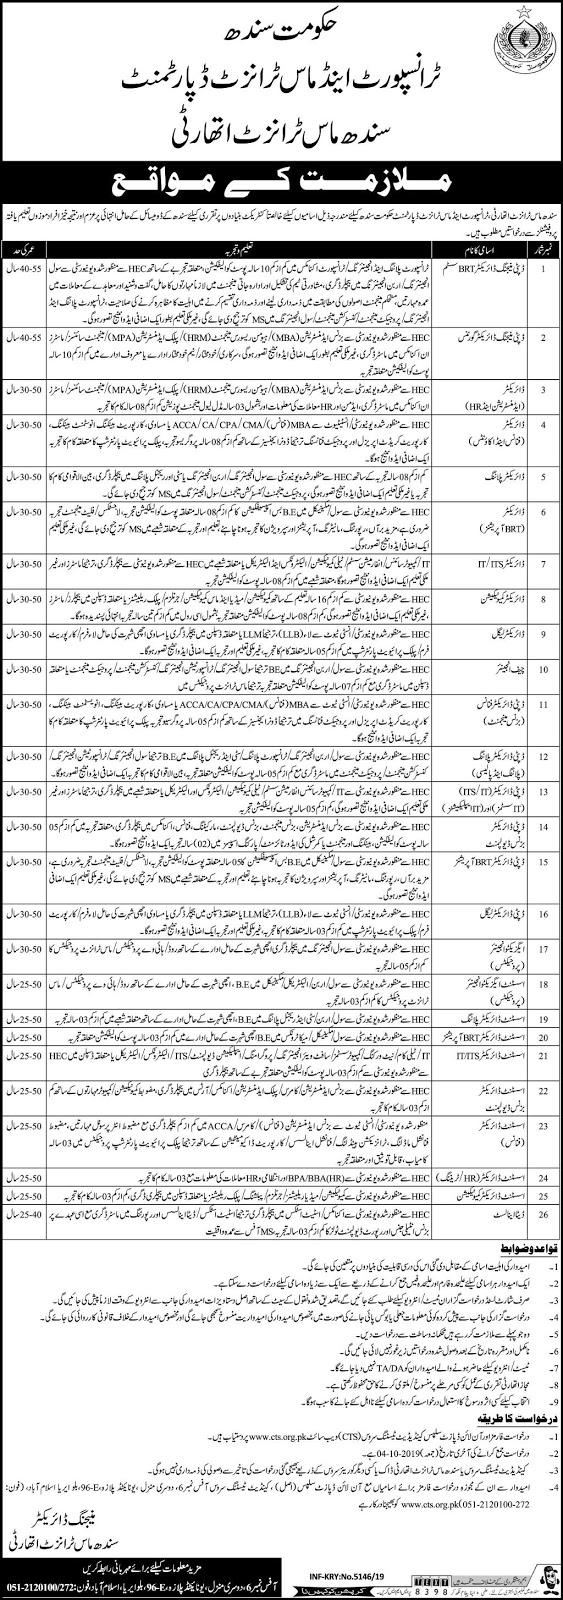 Transport & Mass Transit Department Sindh Mass Transit Authority Jobs 2019